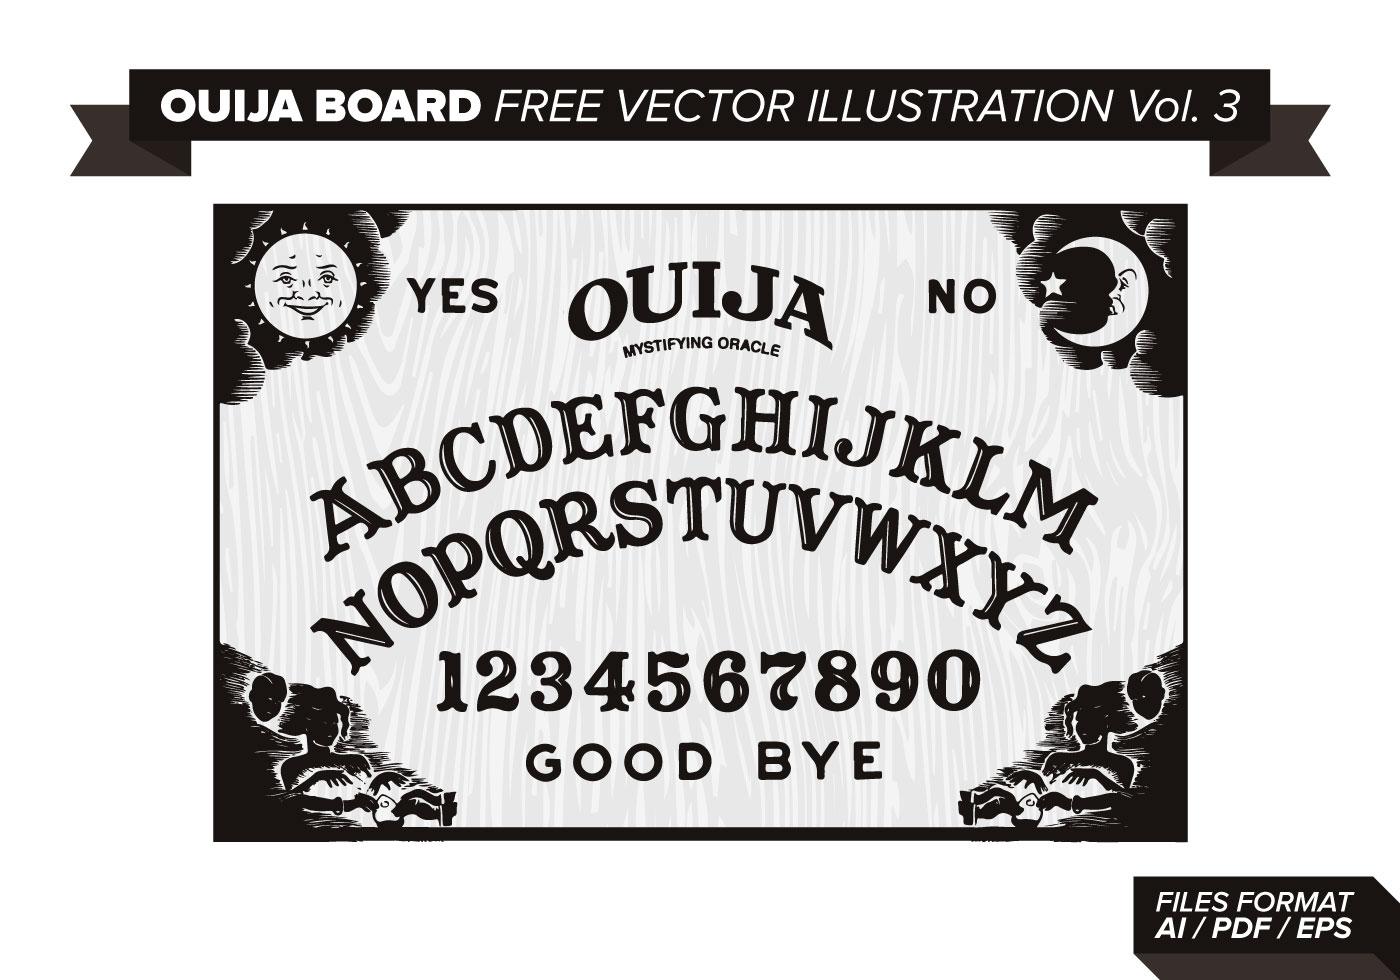 Ouija Board Free Vector Illustration Vol. 3.